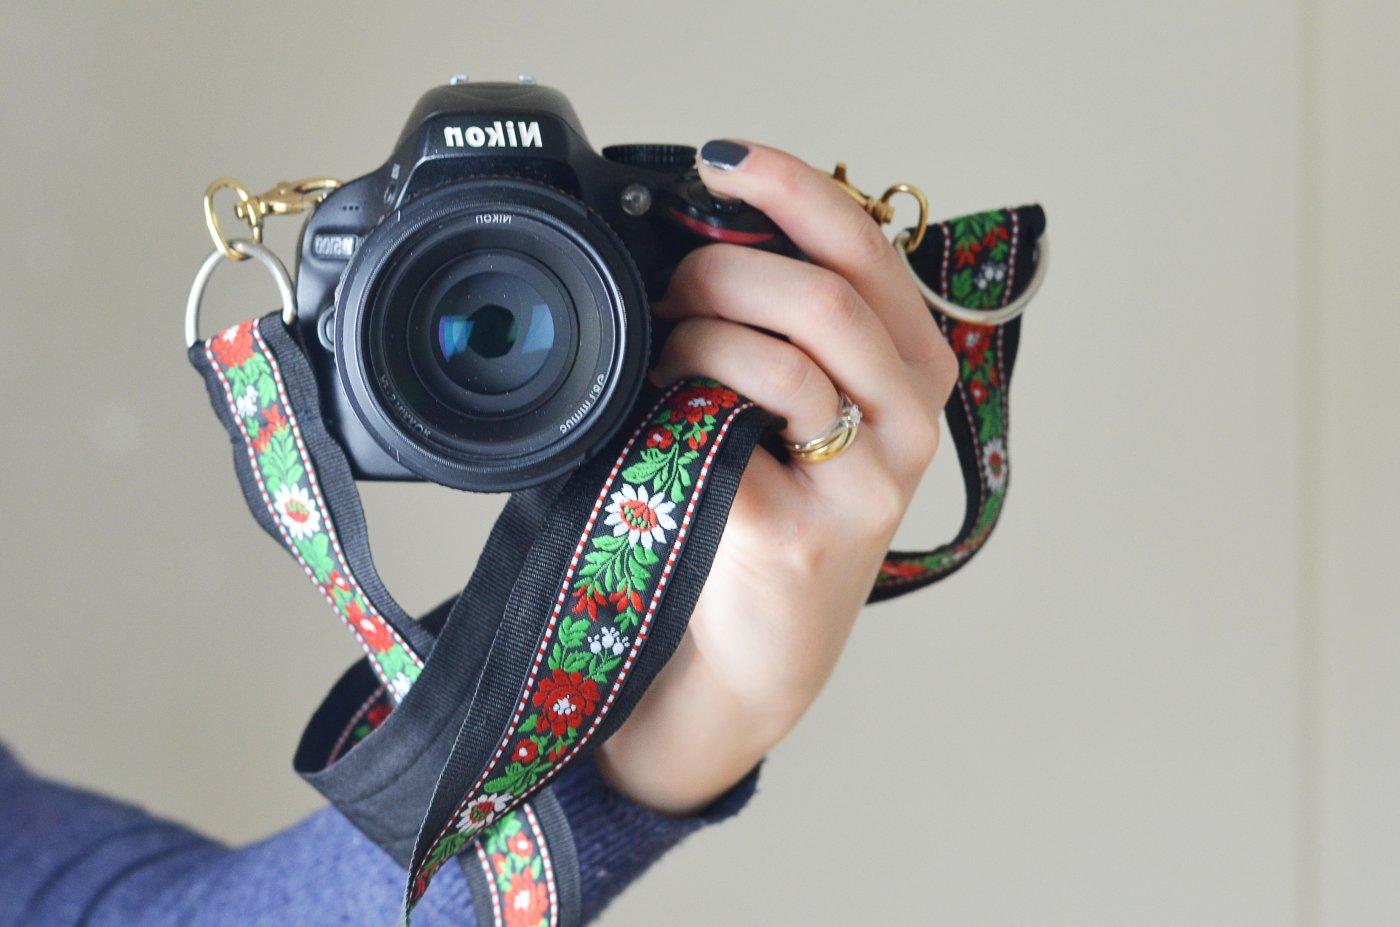 Pasek do aparatu - wzory ludowe